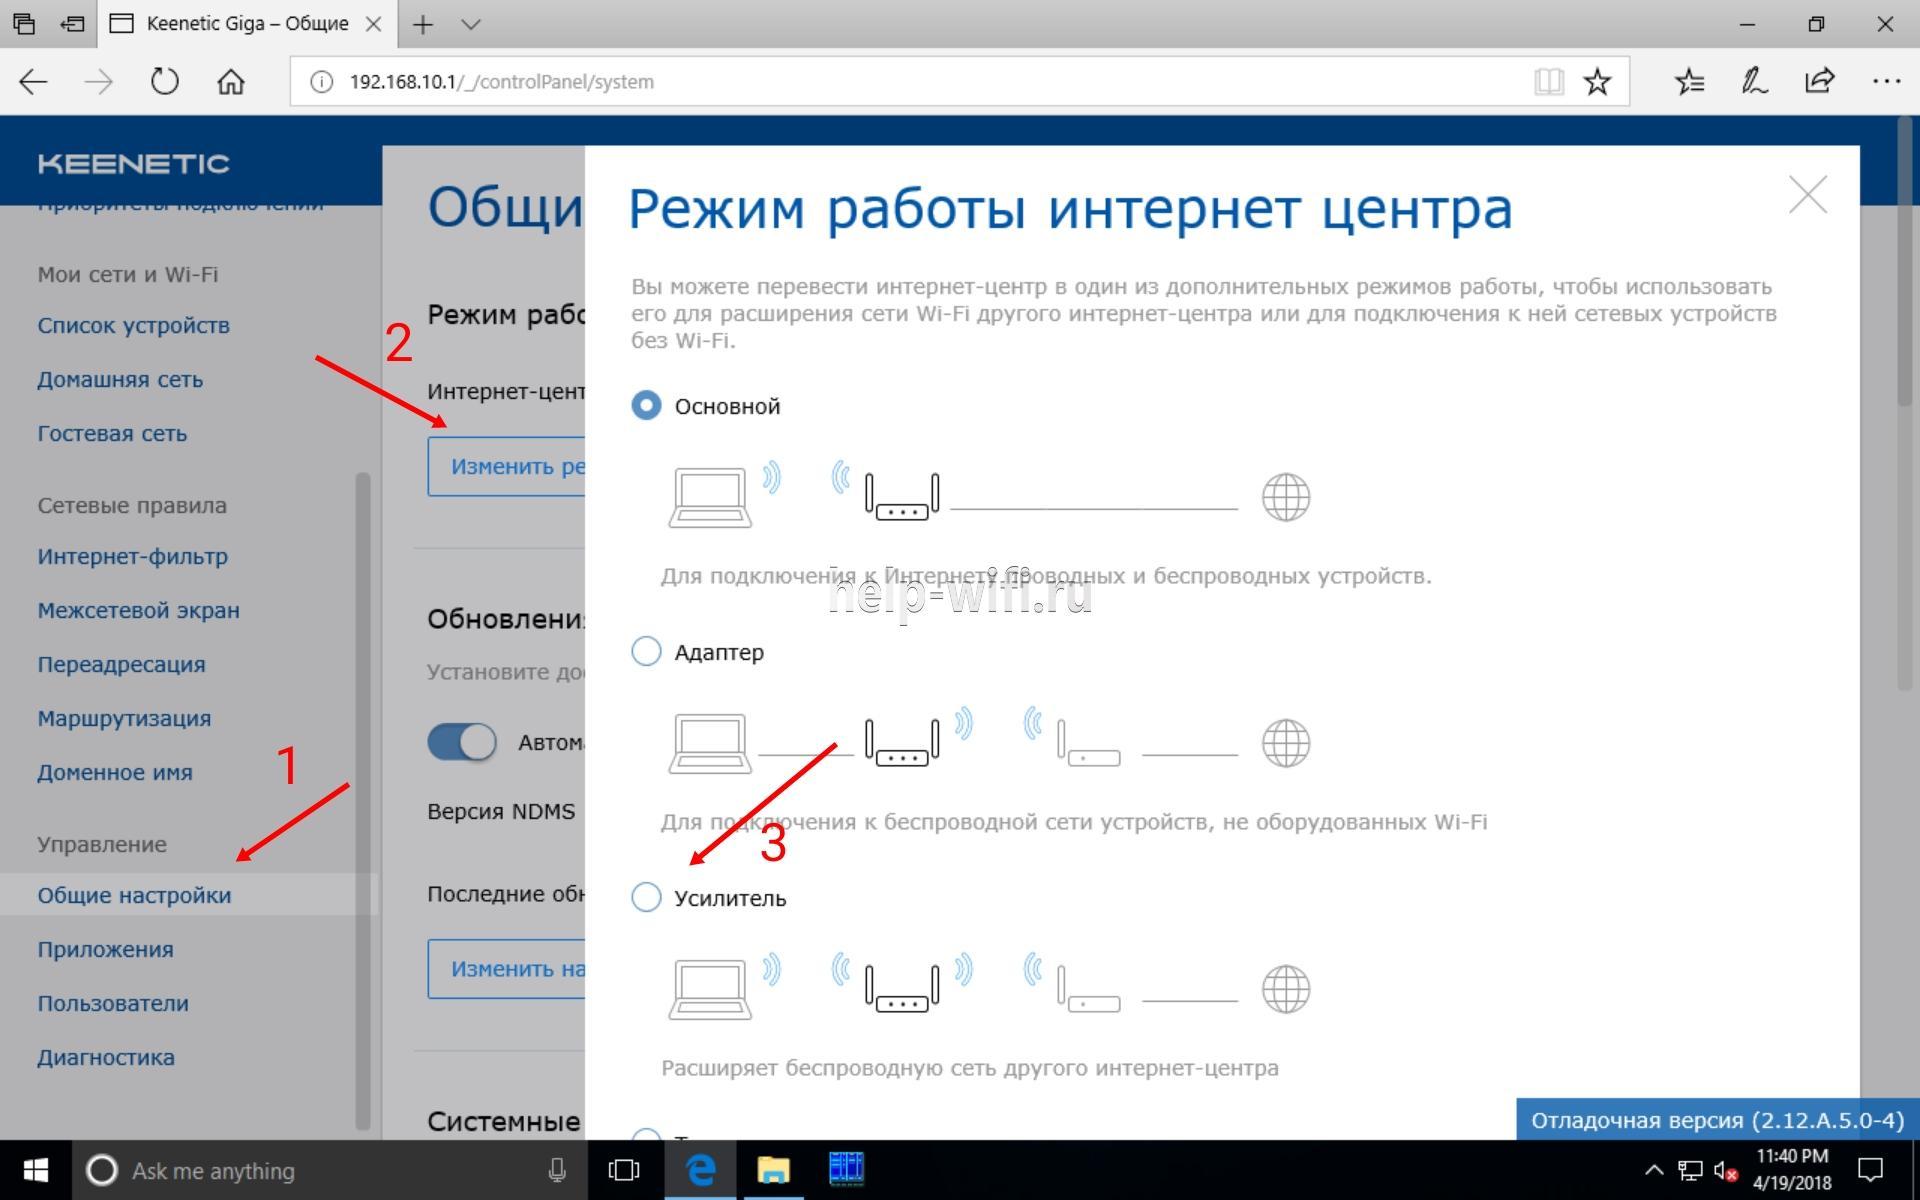 режим ретранслятора в веб конфигураторе